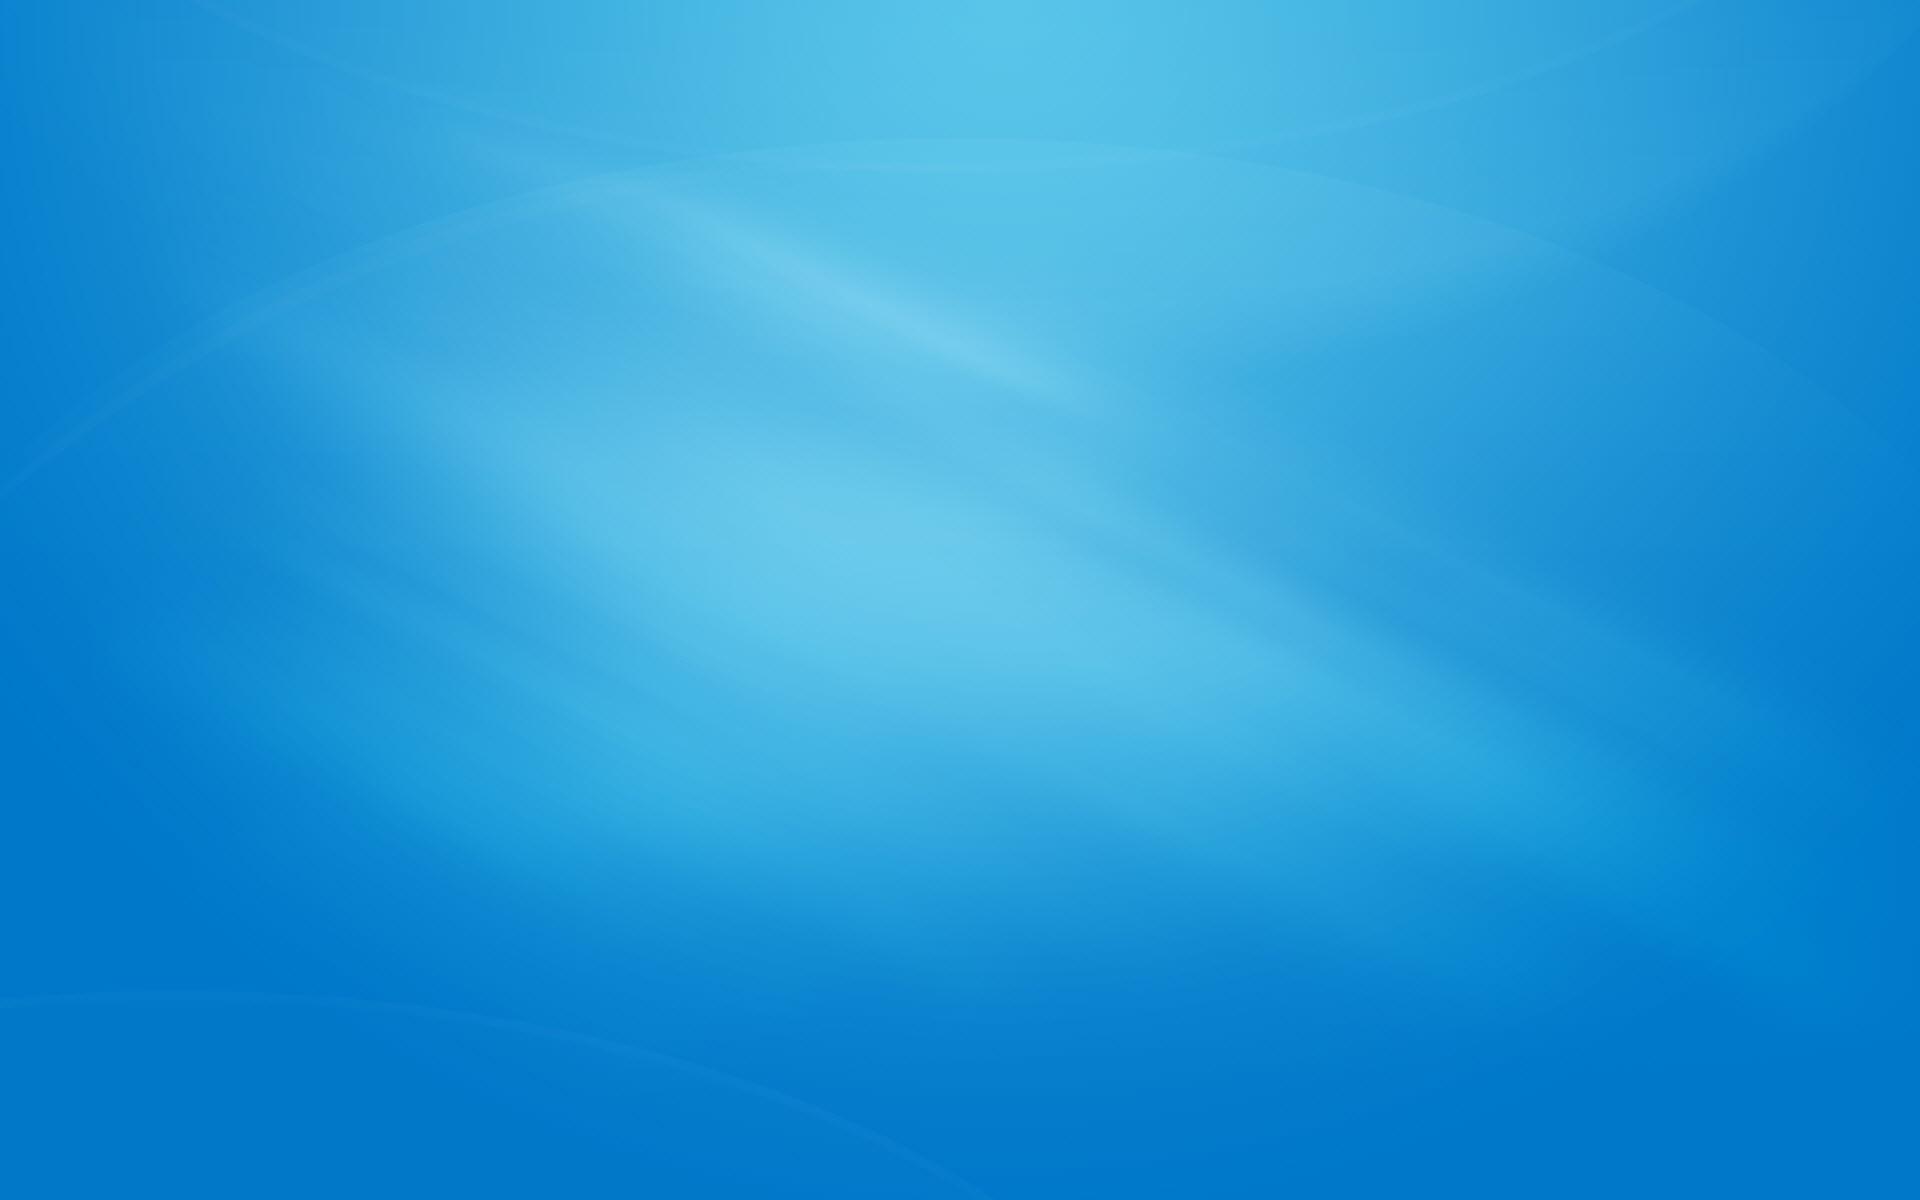 HD Desktop Blue Wallpapers HD Wallpapers 1920x1200